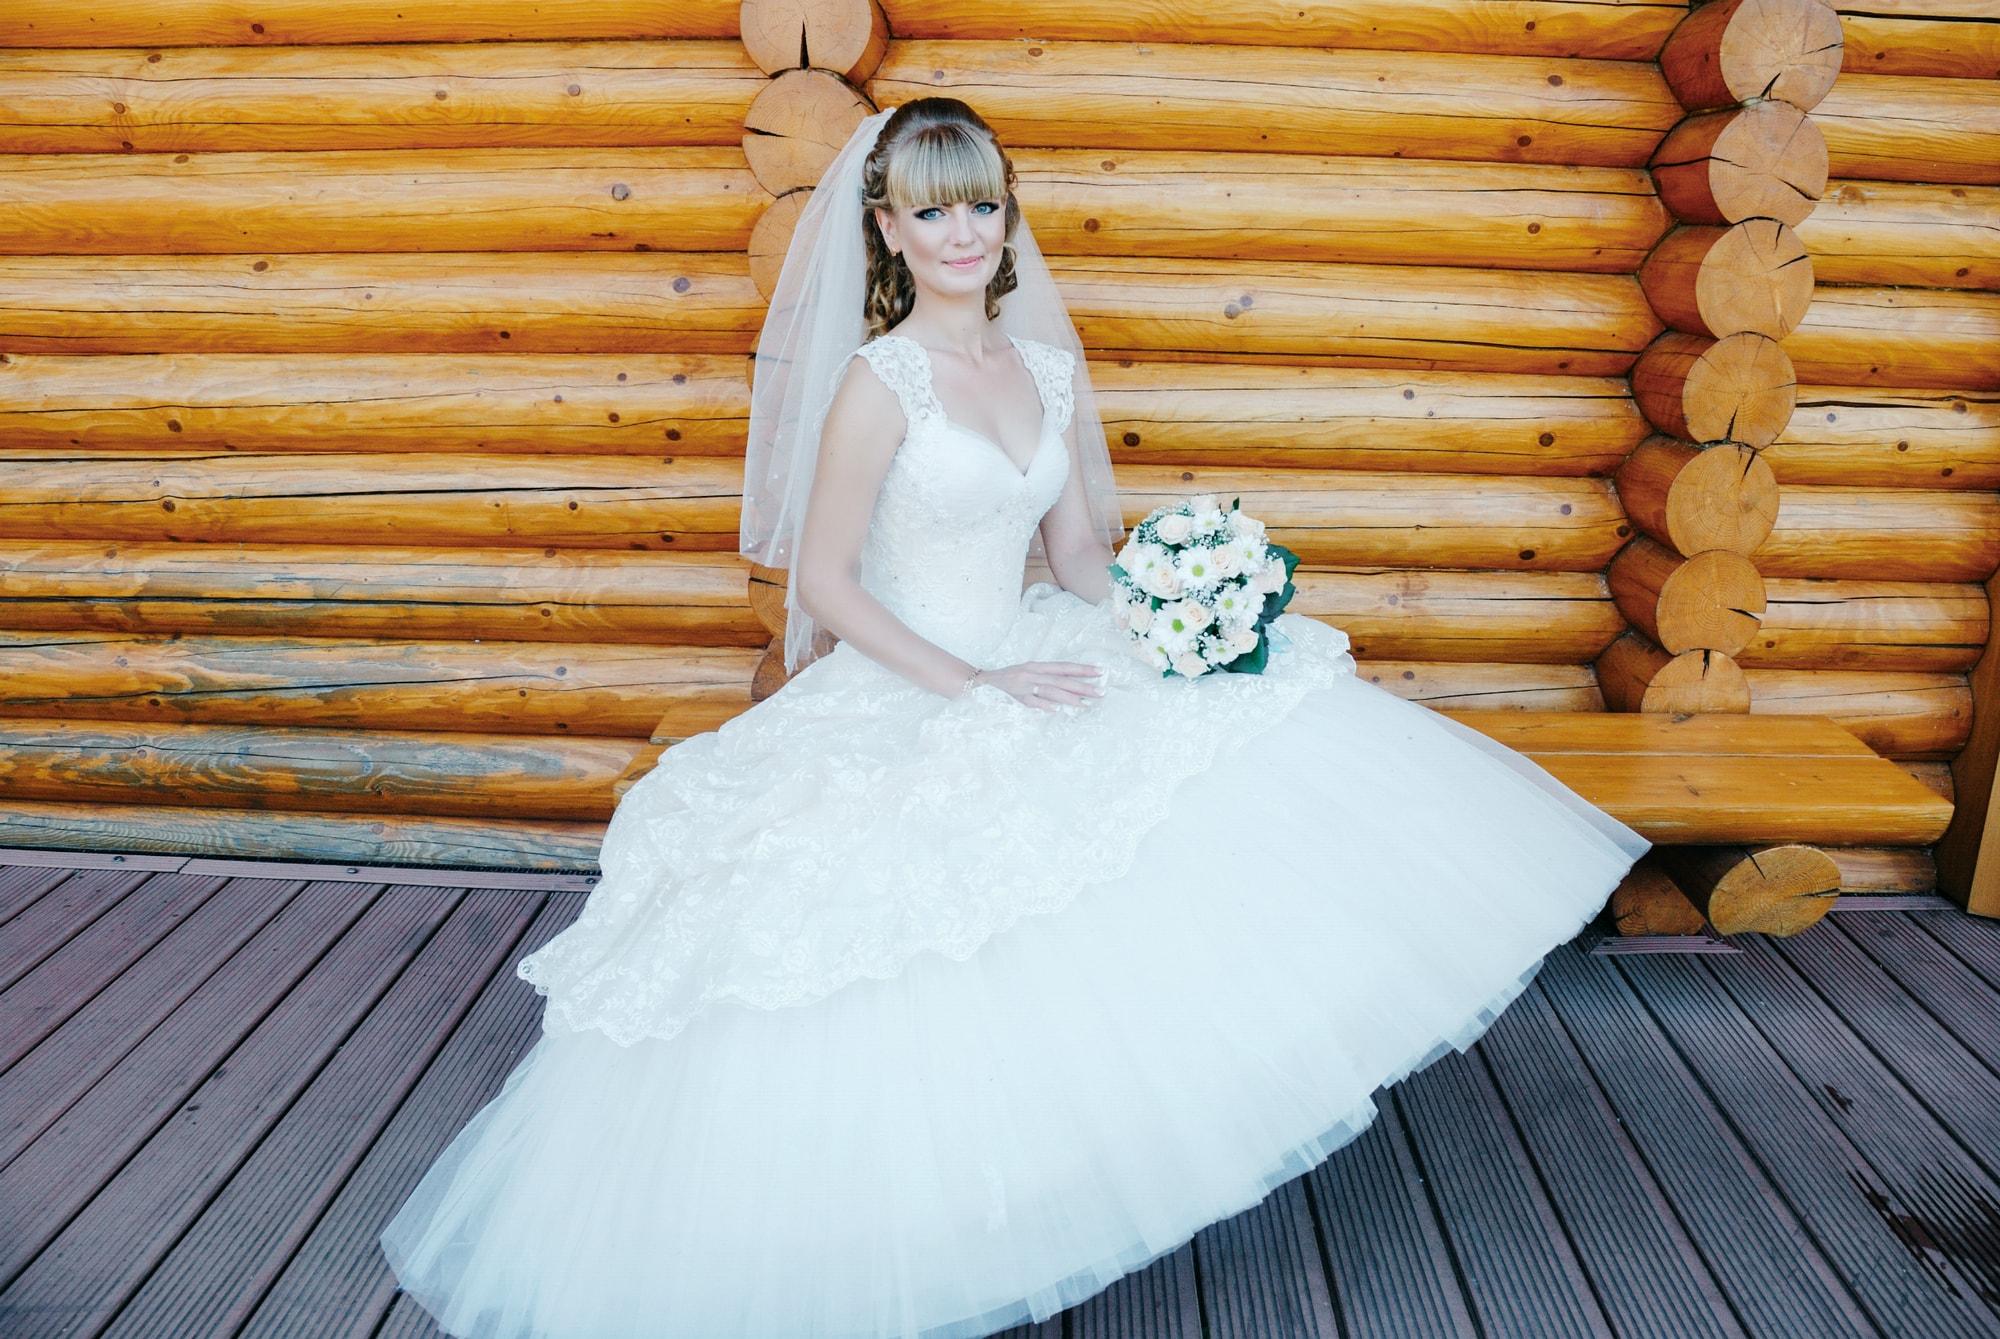 На скамейка возле избушки - Фотограф Киев - Женя Лайт